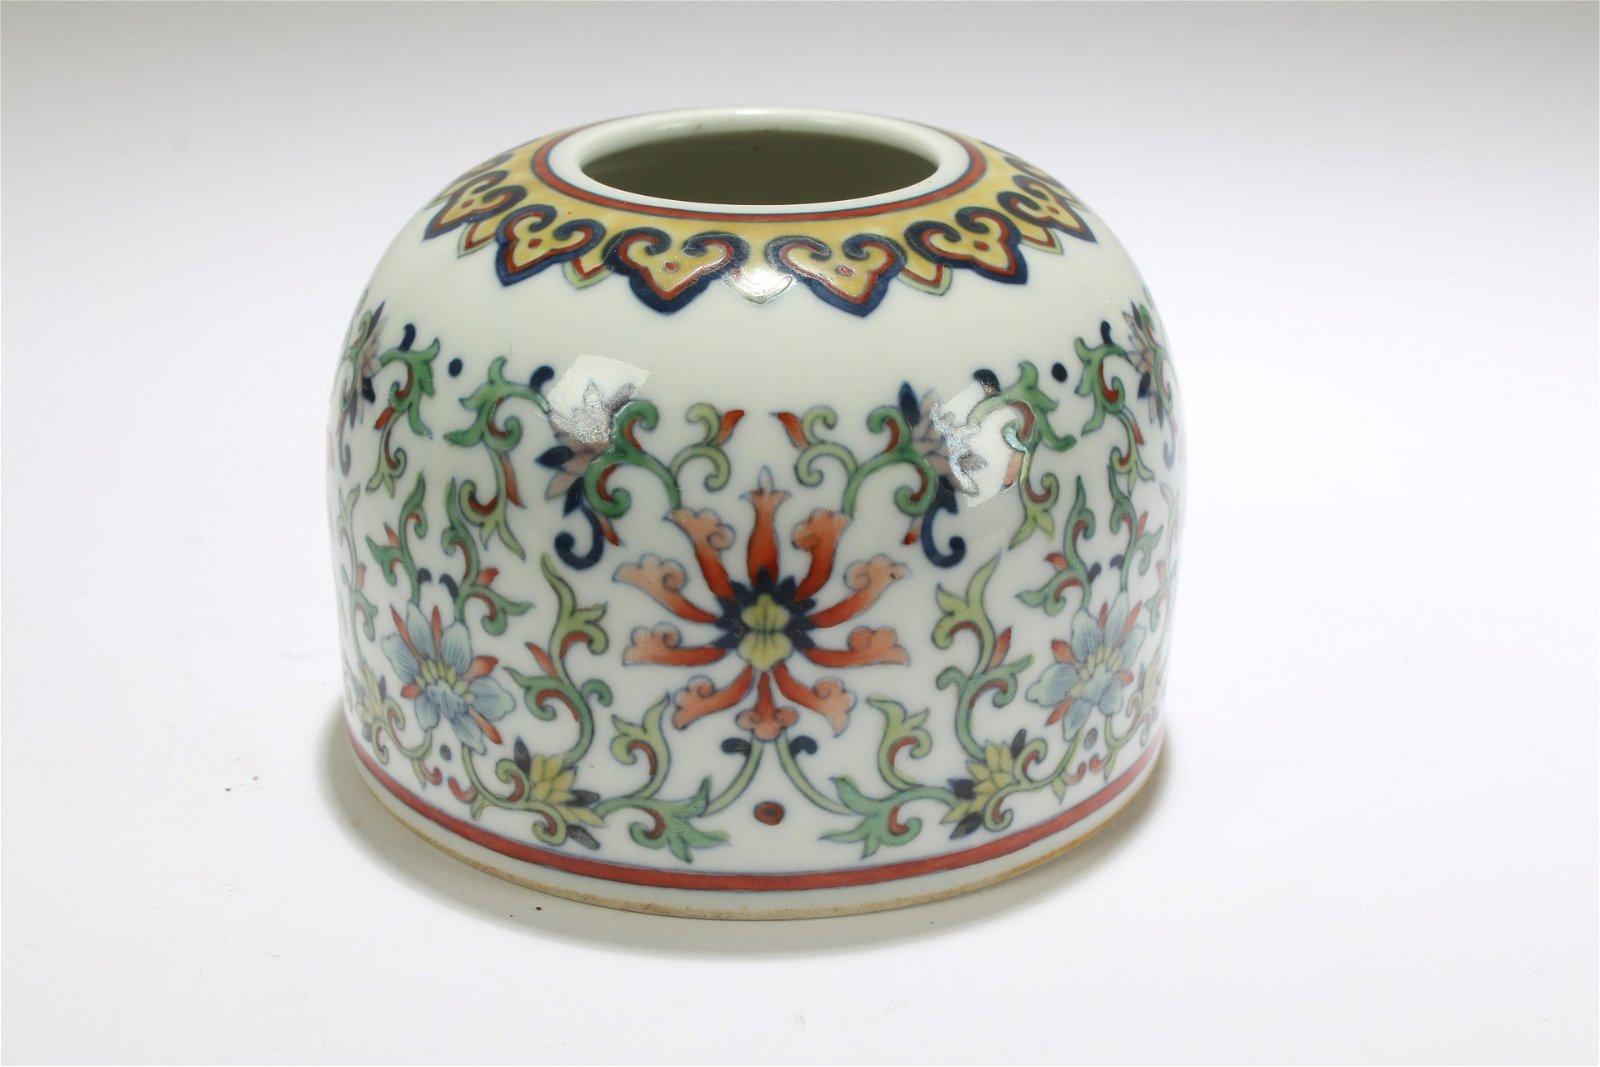 A Chinese Bat-framing Estate Fortune Porcelain Display